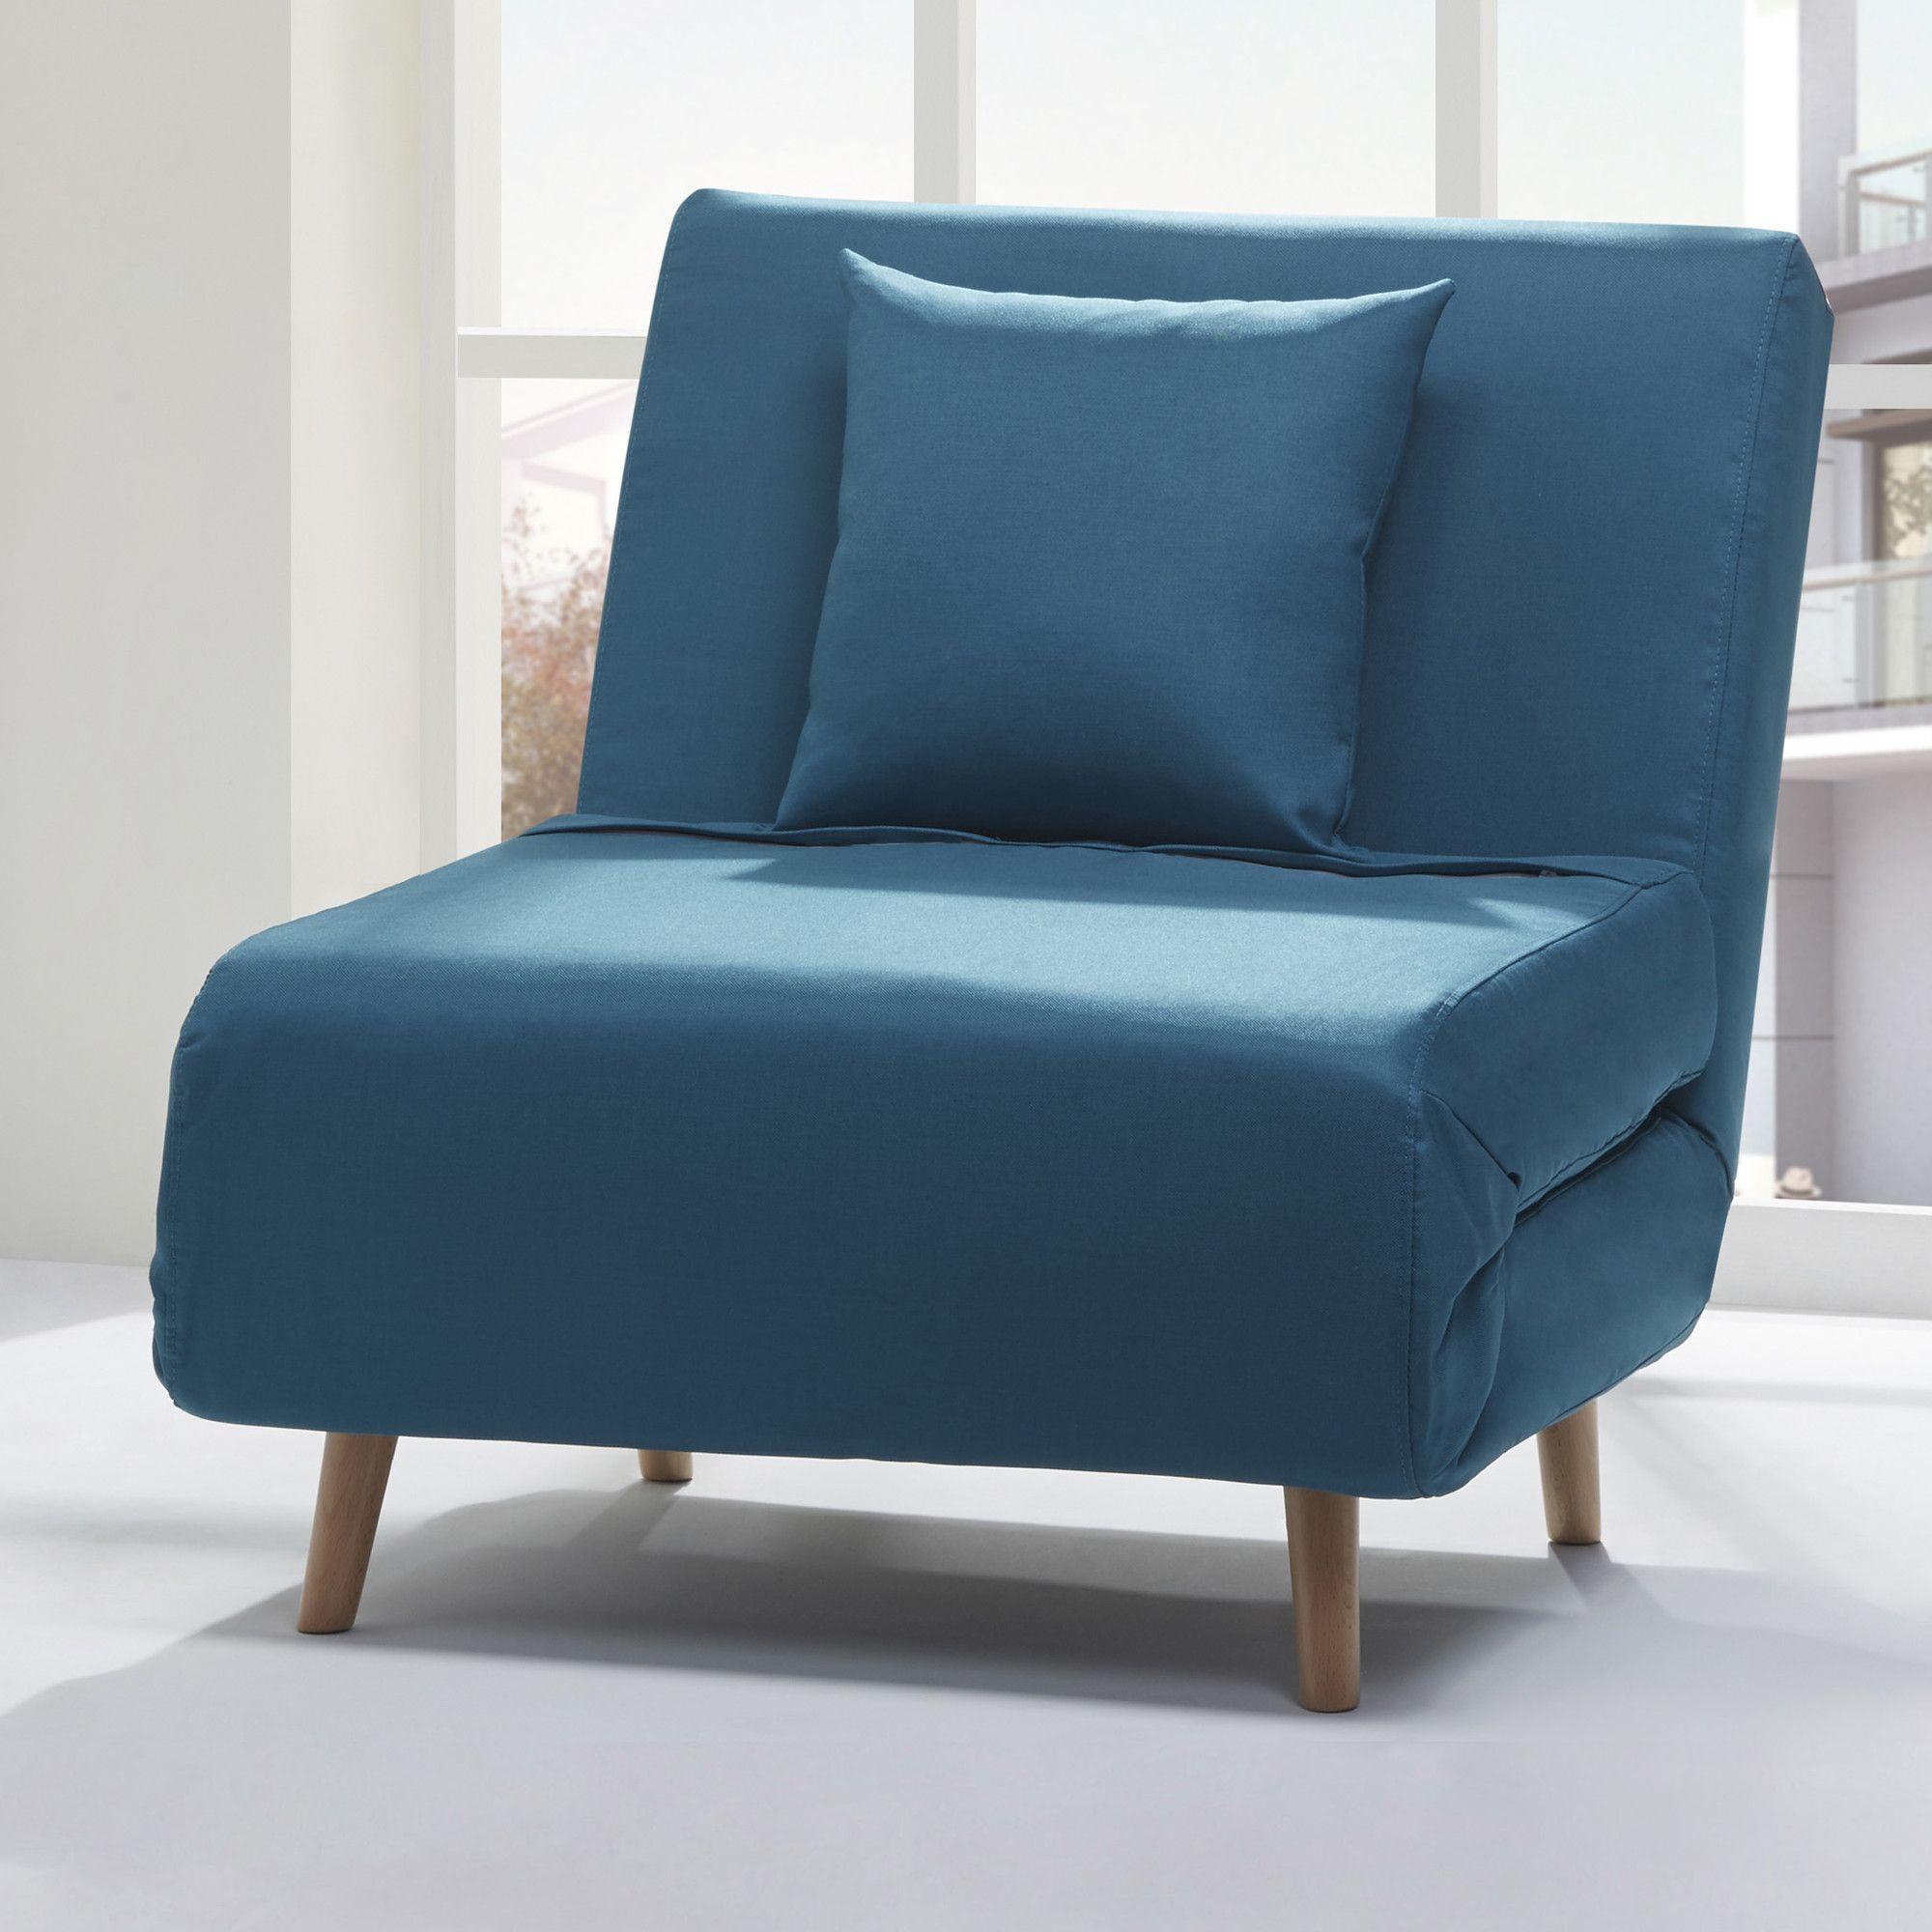 Wolfe Convertible Chair & Wolfe Convertible Chair | wish list | Pinterest | Convertible